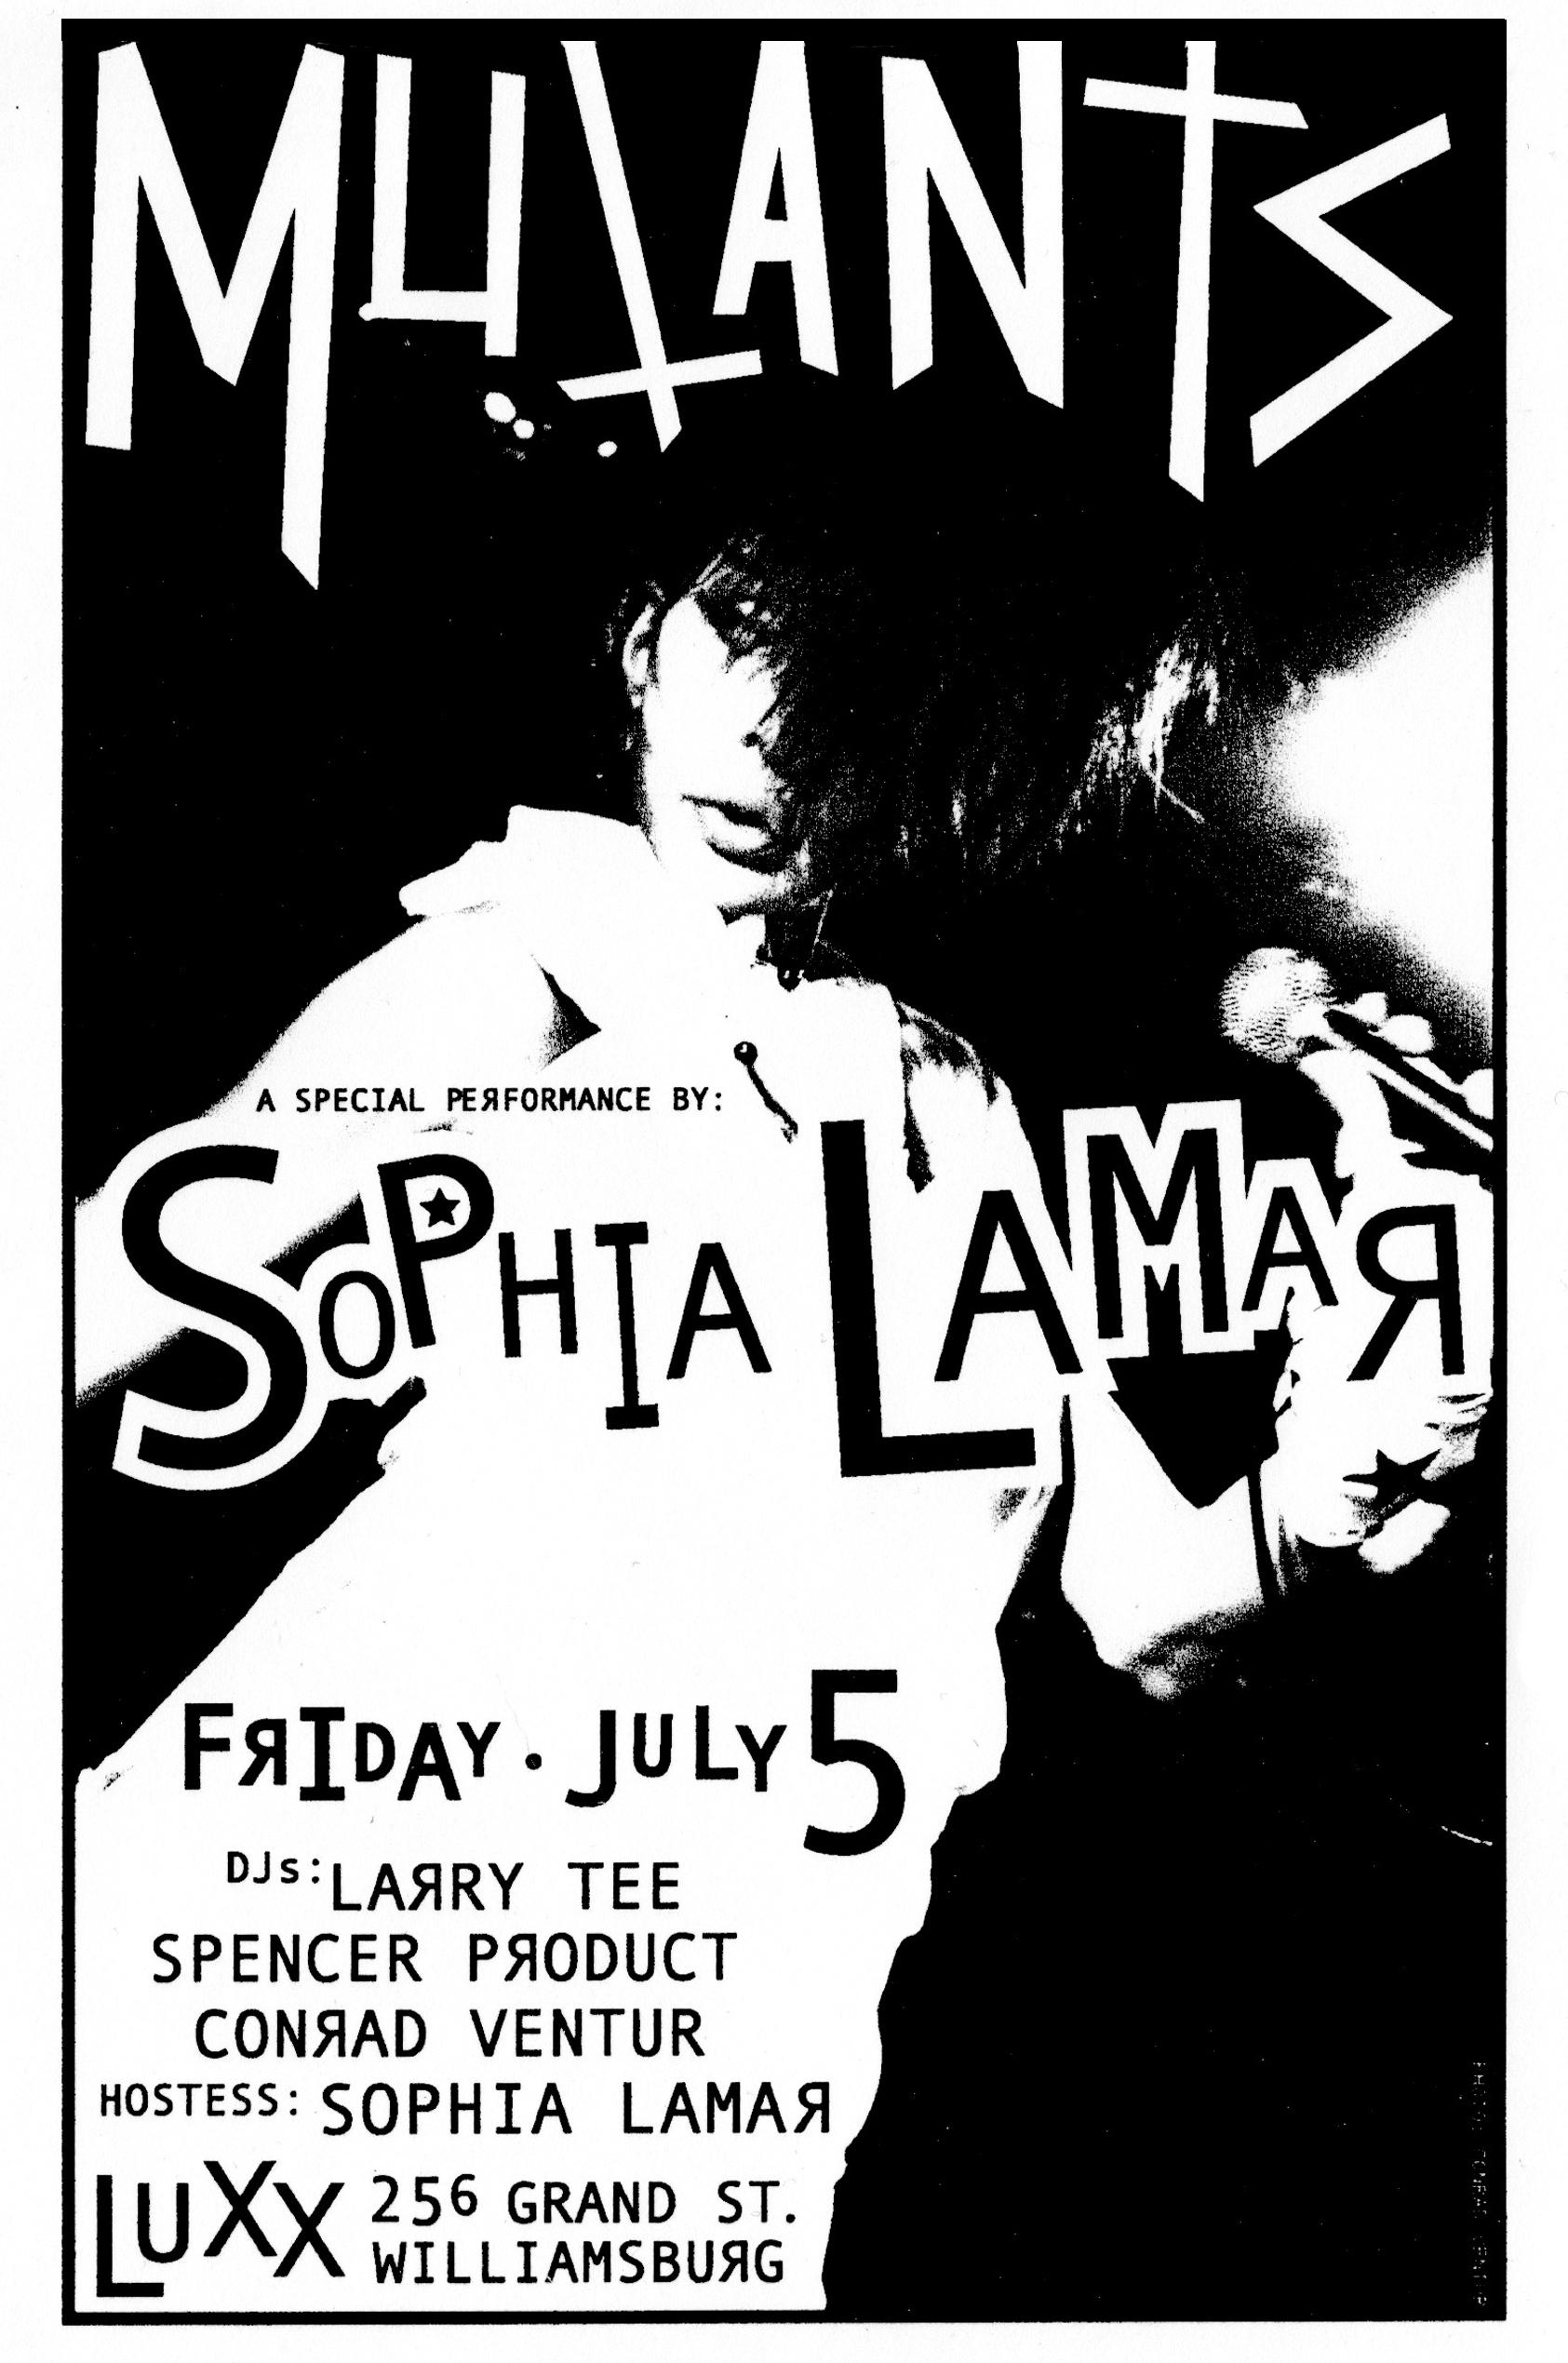 Mutants - Sophia Lamar